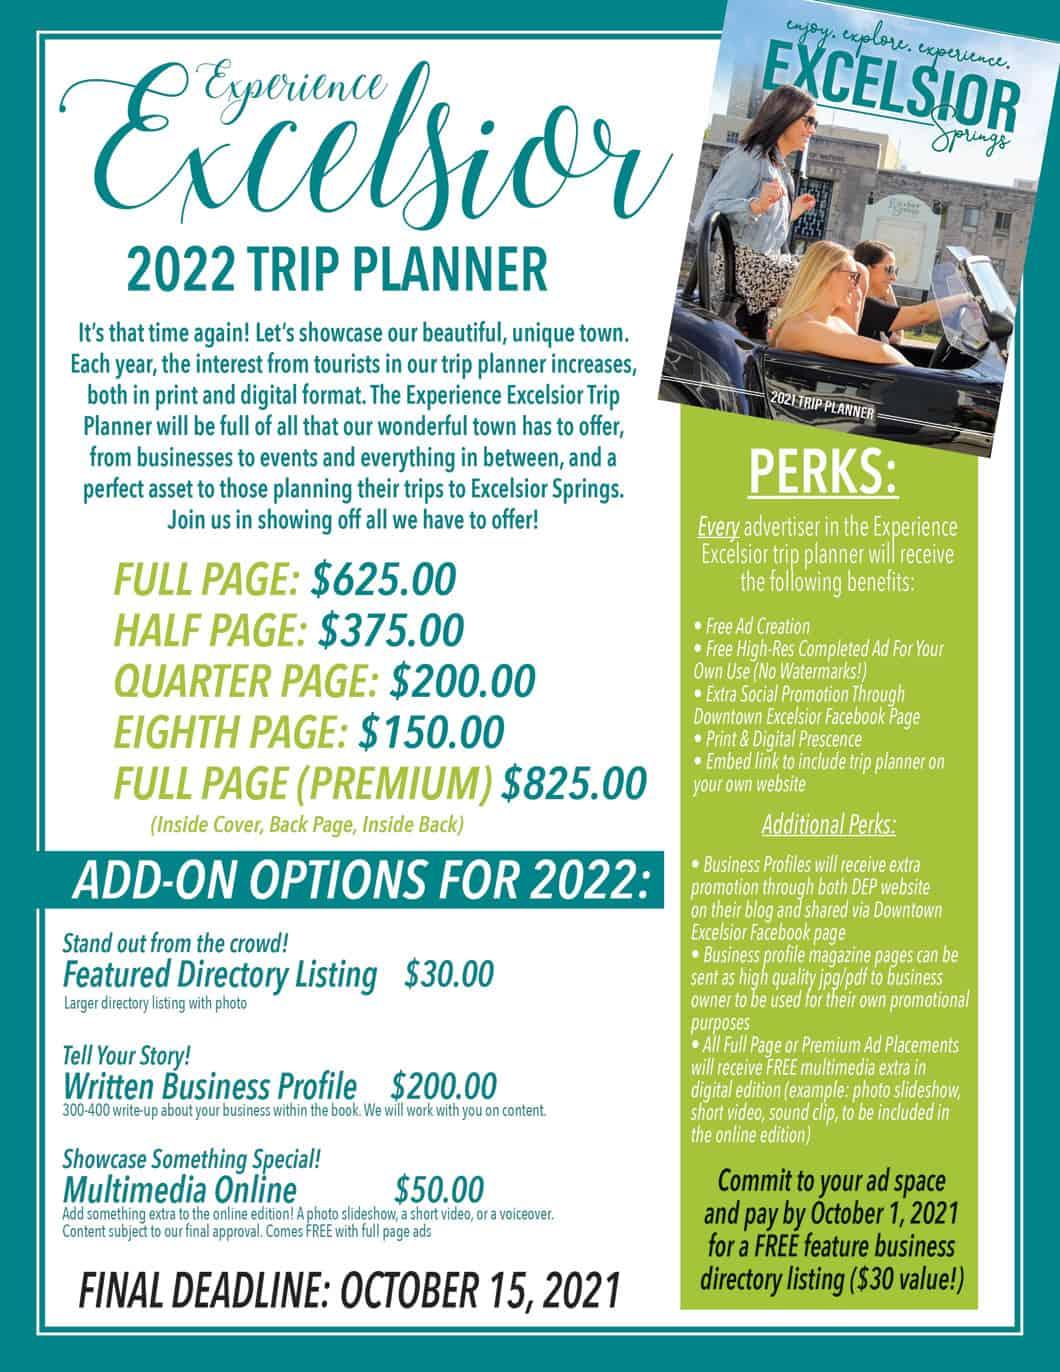 2022 Trip Planner Rates